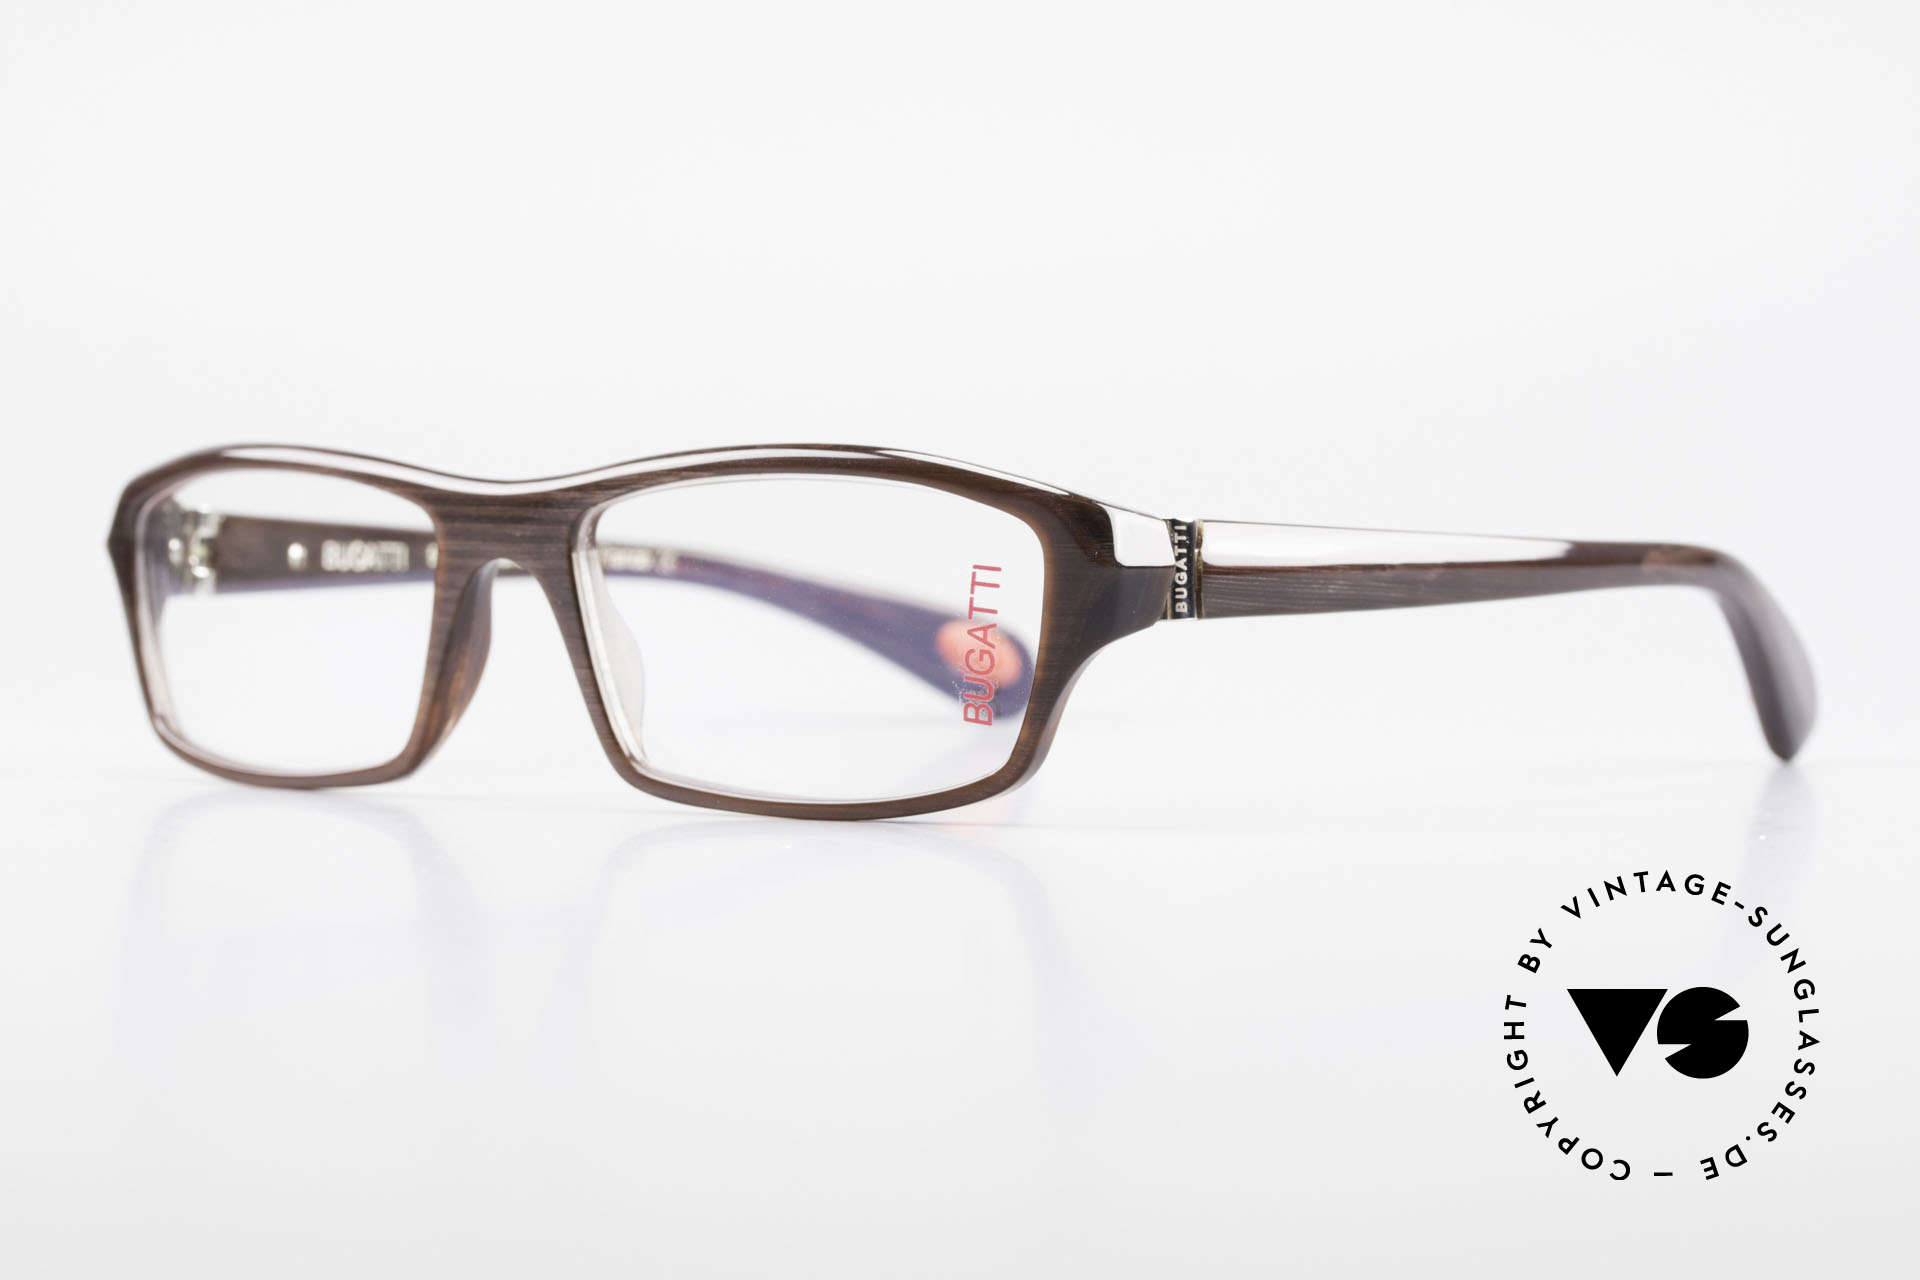 Bugatti 471 Vintage Designer Glasses Men, 1. class wearing comfort due to spring hinges, Made for Men